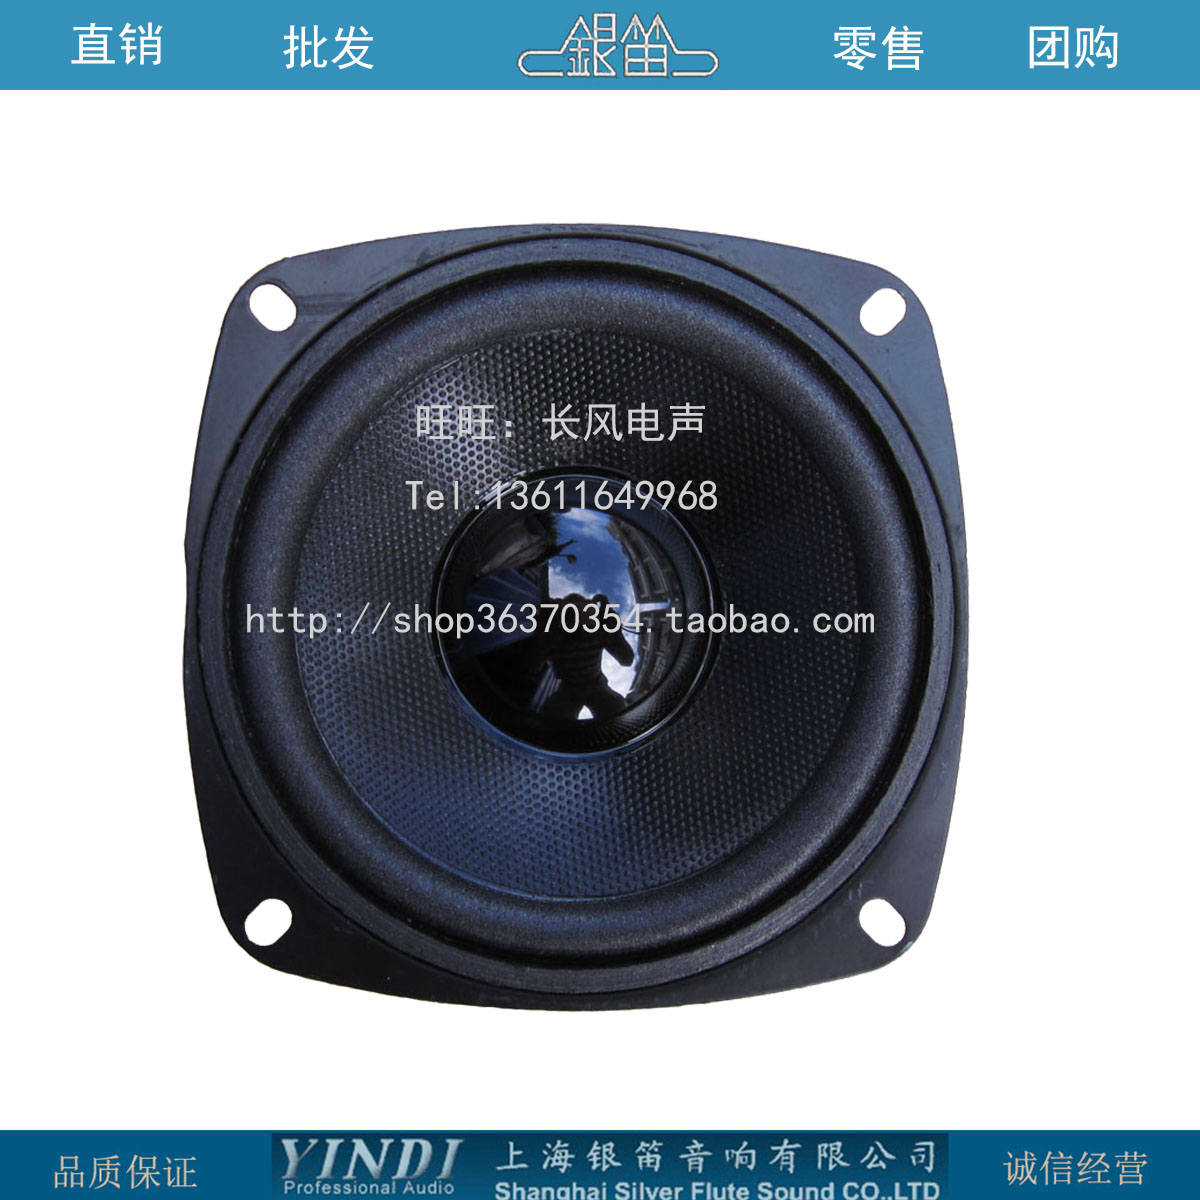 автомобильные колонки Shanghai Silver Flute  YD106-822P-S shanghai chun shu chunz chun leveled kp1000a 1600v convex plate scr thyristors package mail